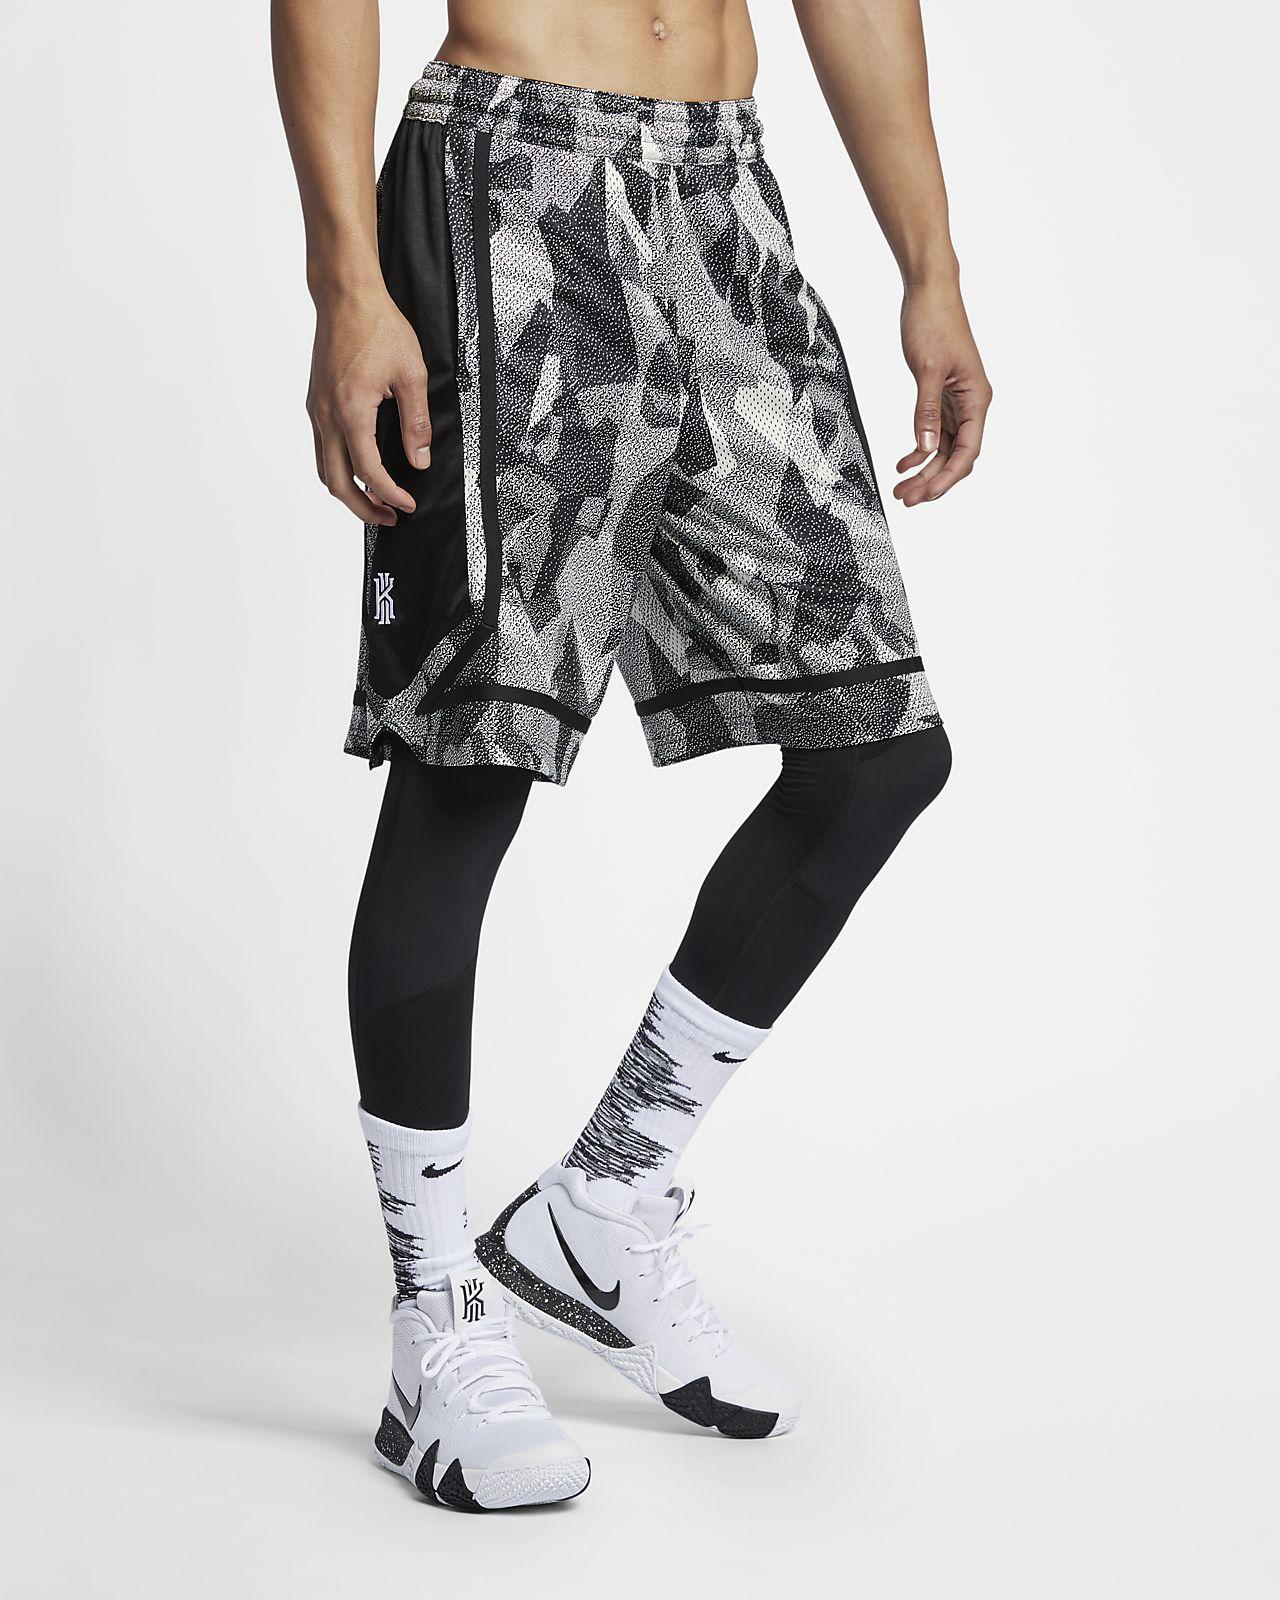 Kyrie Dri-FIT Elite Pantalón corto de baloncesto - Hombre